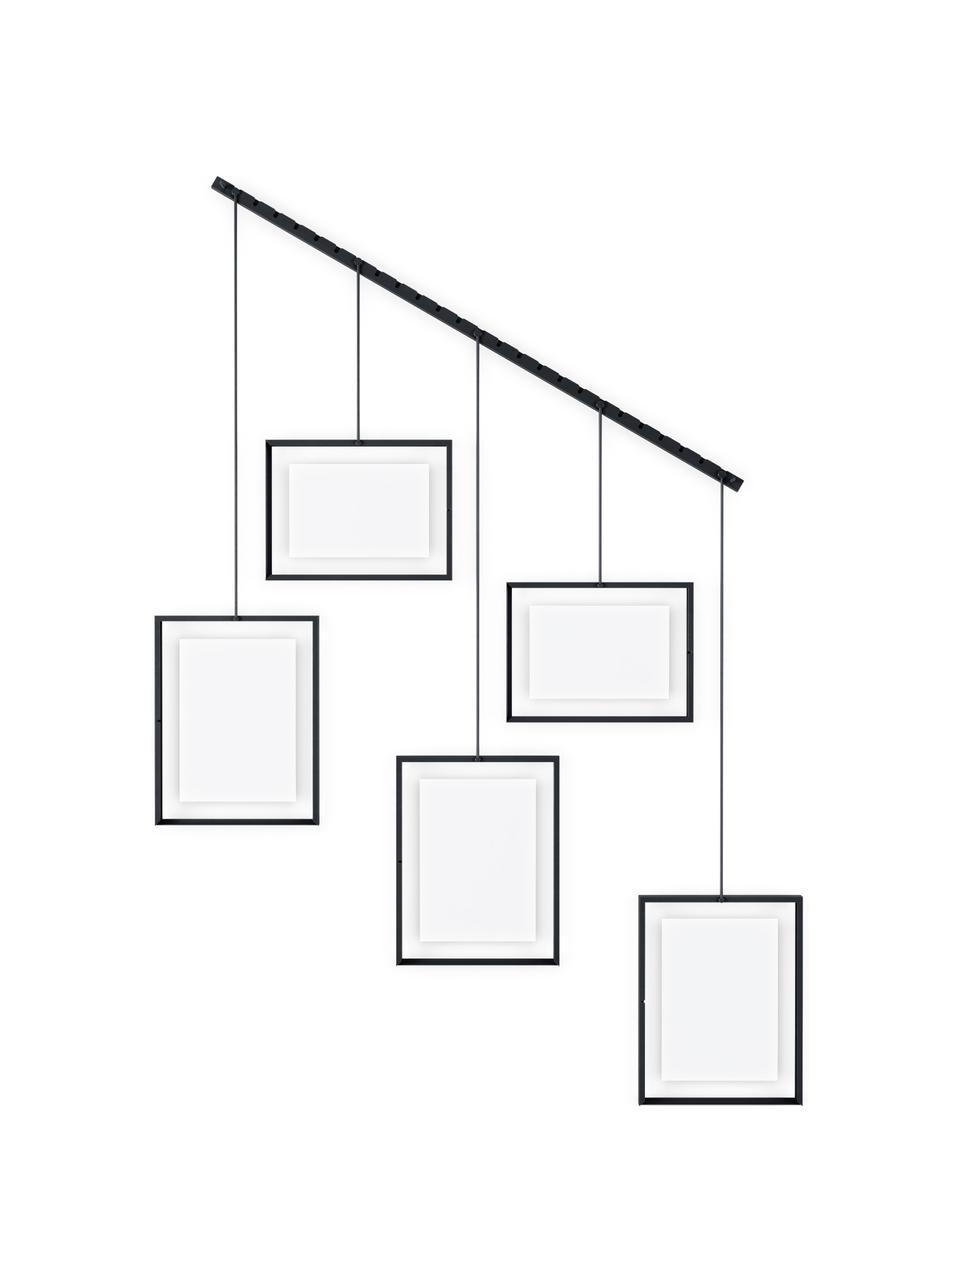 Portafoto multiplo da parete Exhibit, Metallo rivestito, Nero, Set in varie misure